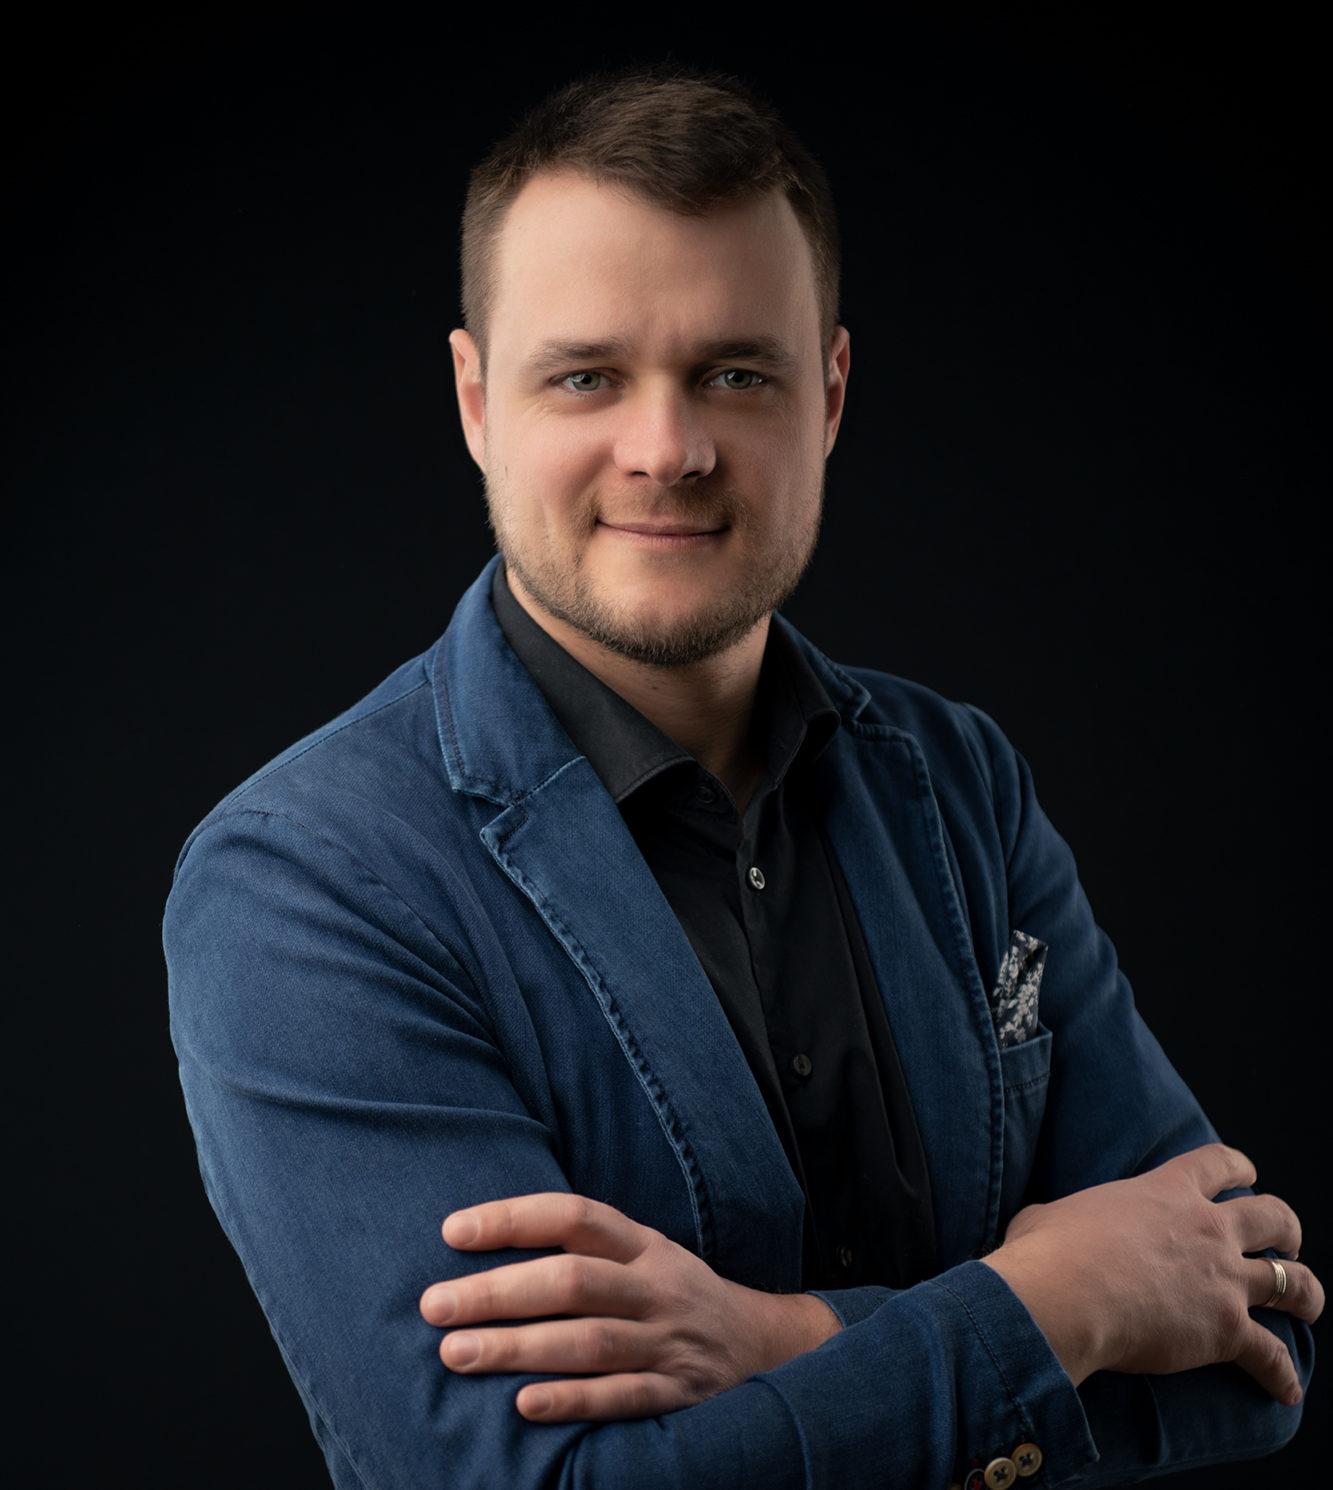 Dimitri Karich